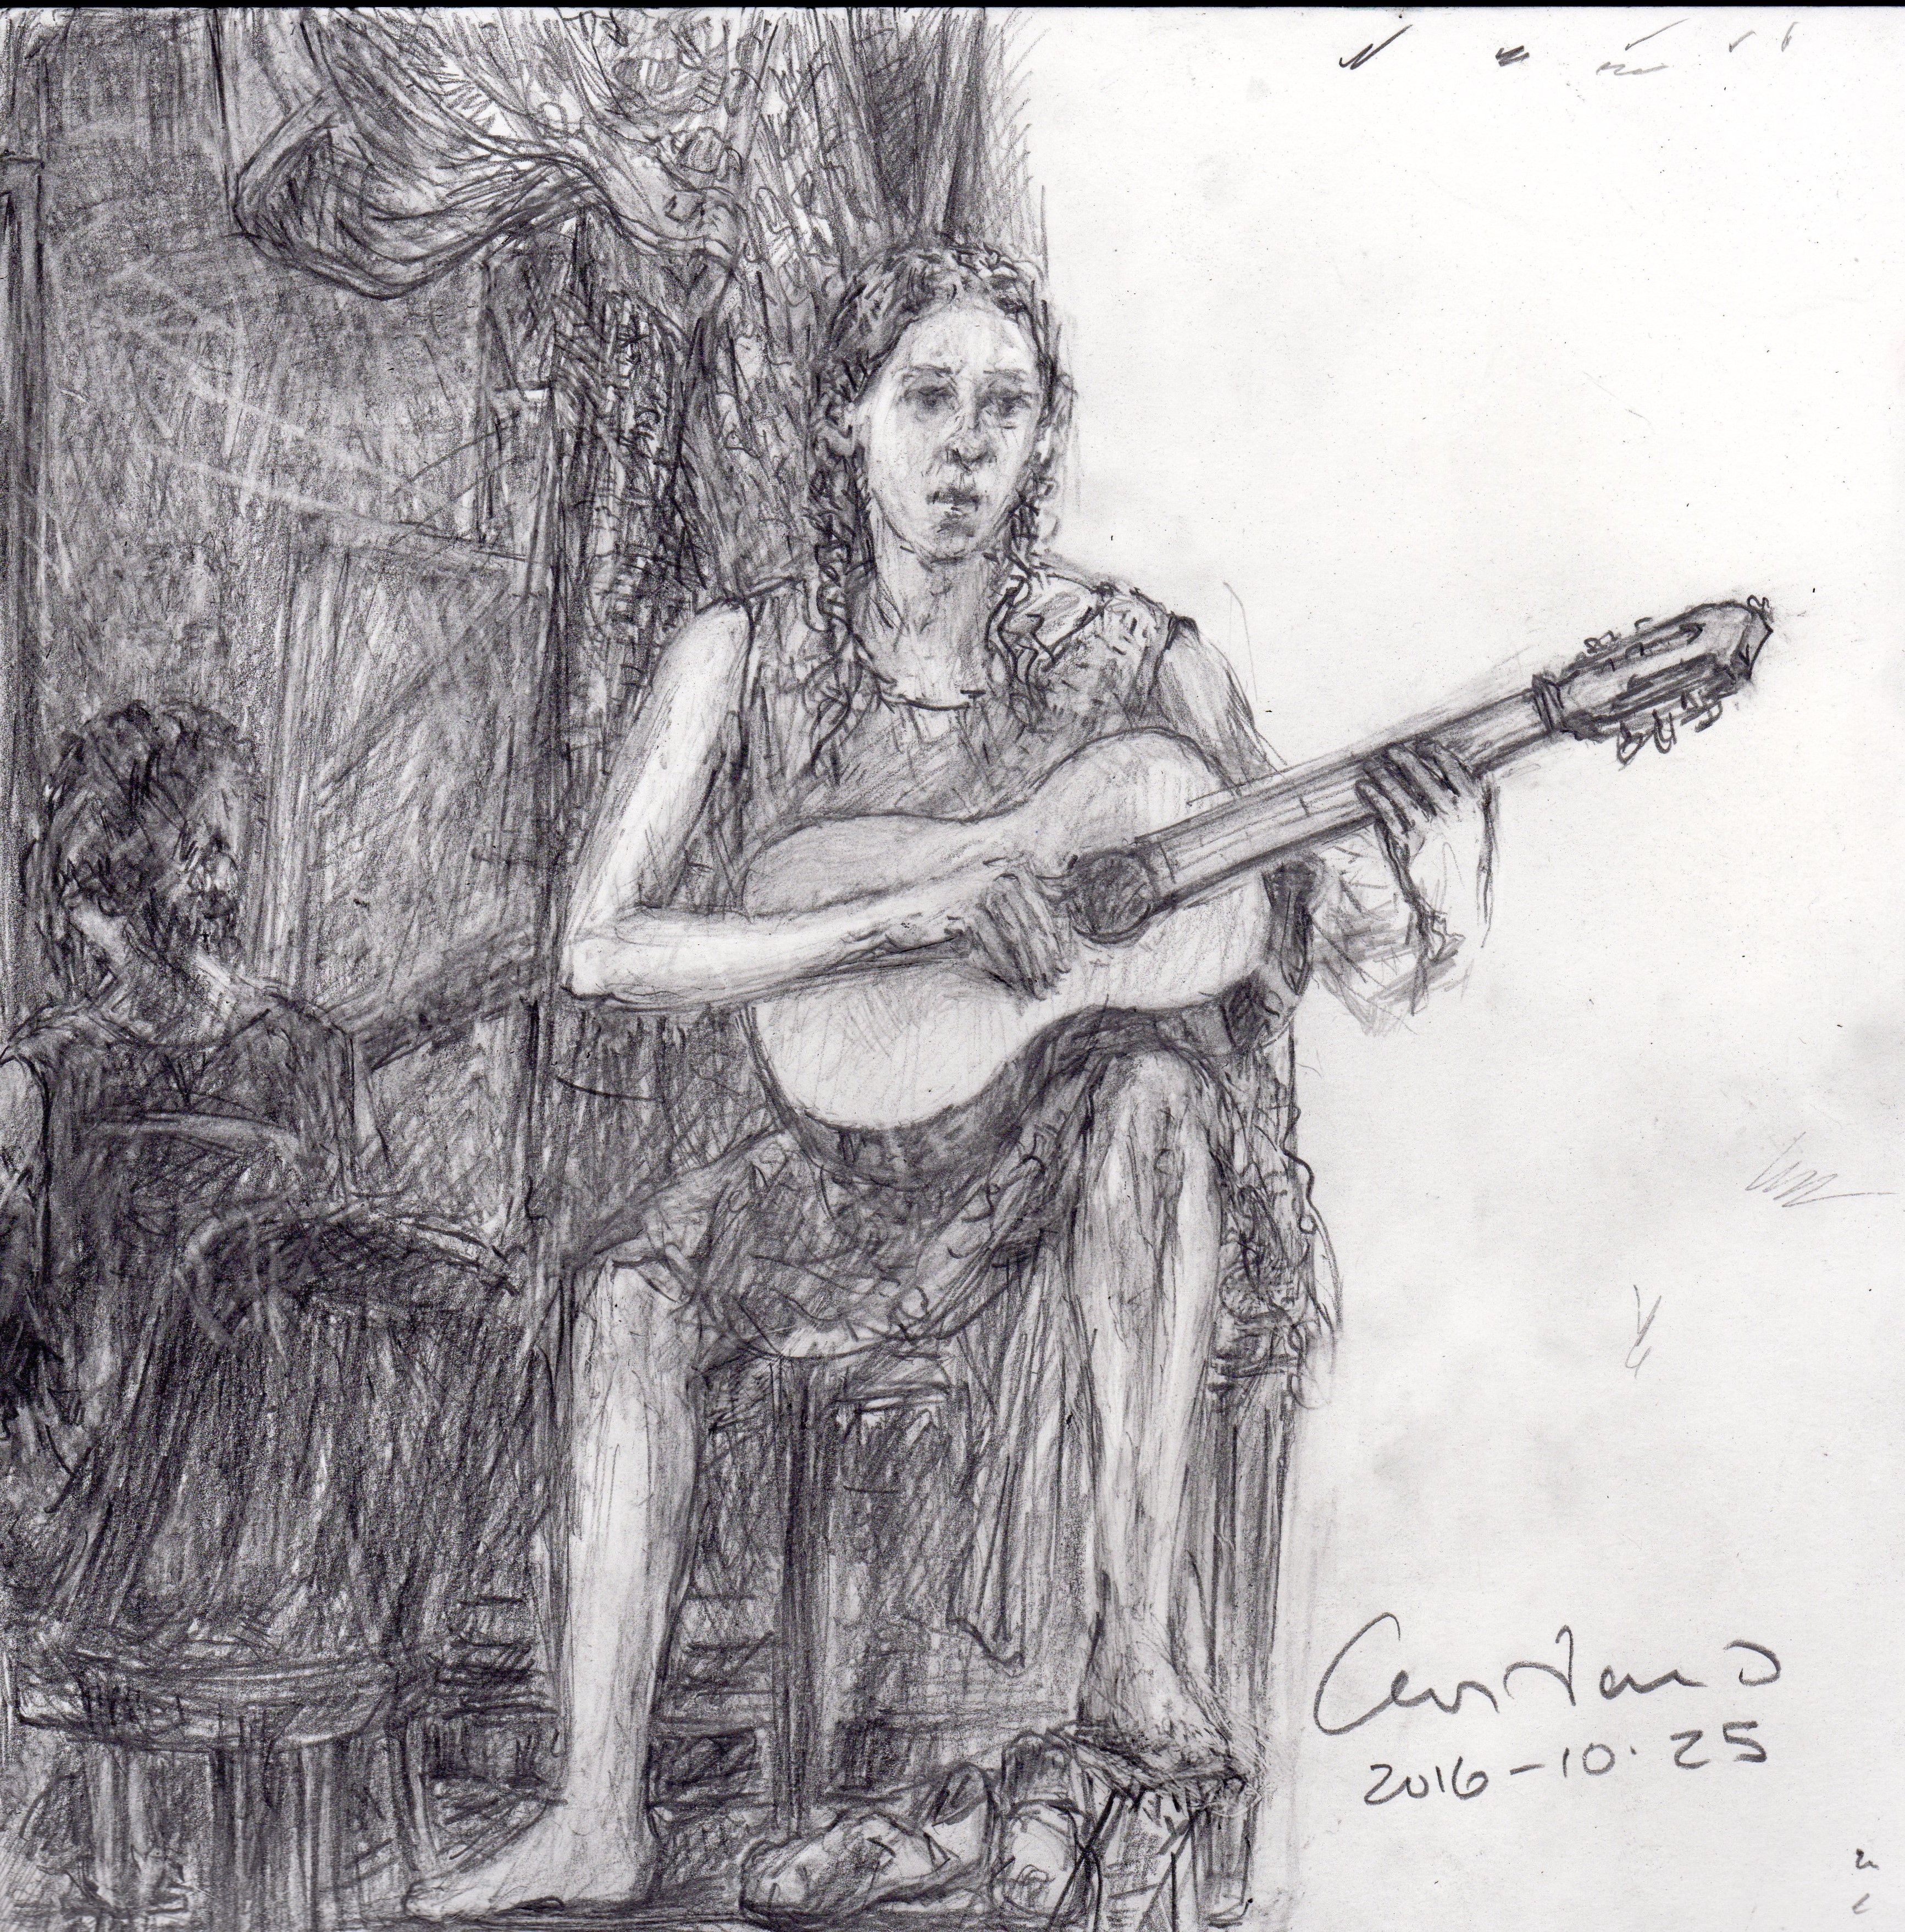 2016-10-25_MARIAN PLAYING GUITAR #2